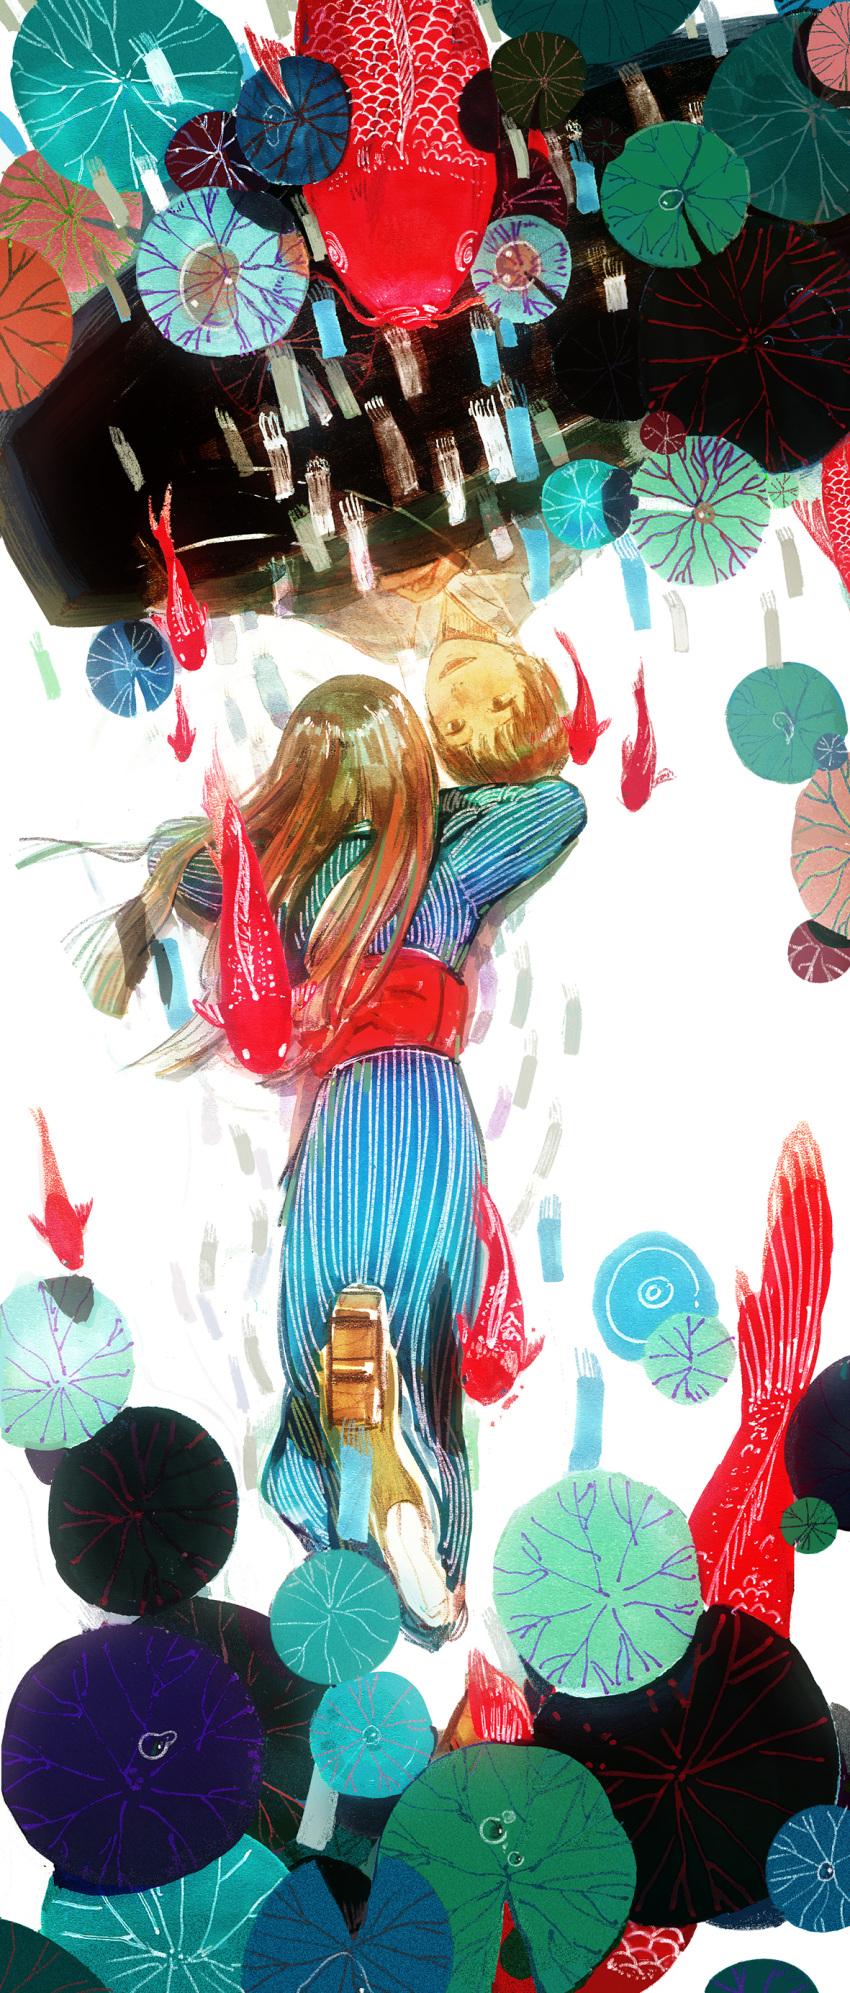 2girls absurdres air_bubble blue_kimono brown_eyes brown_hair bubble different_reflection facing_away foot_up geta h2so4kancel highres japanese_clothes kimono koi lily_pad long_hair long_sleeves looking_at_another lying multiple_girls mushishi obi on_stomach red_sash reflection ripples sash short_hair striped sumi_(mushishi) surreal traditional_media upside-down vertical_stripes watercolor_(medium) white_background yukata yura_(mushishi)